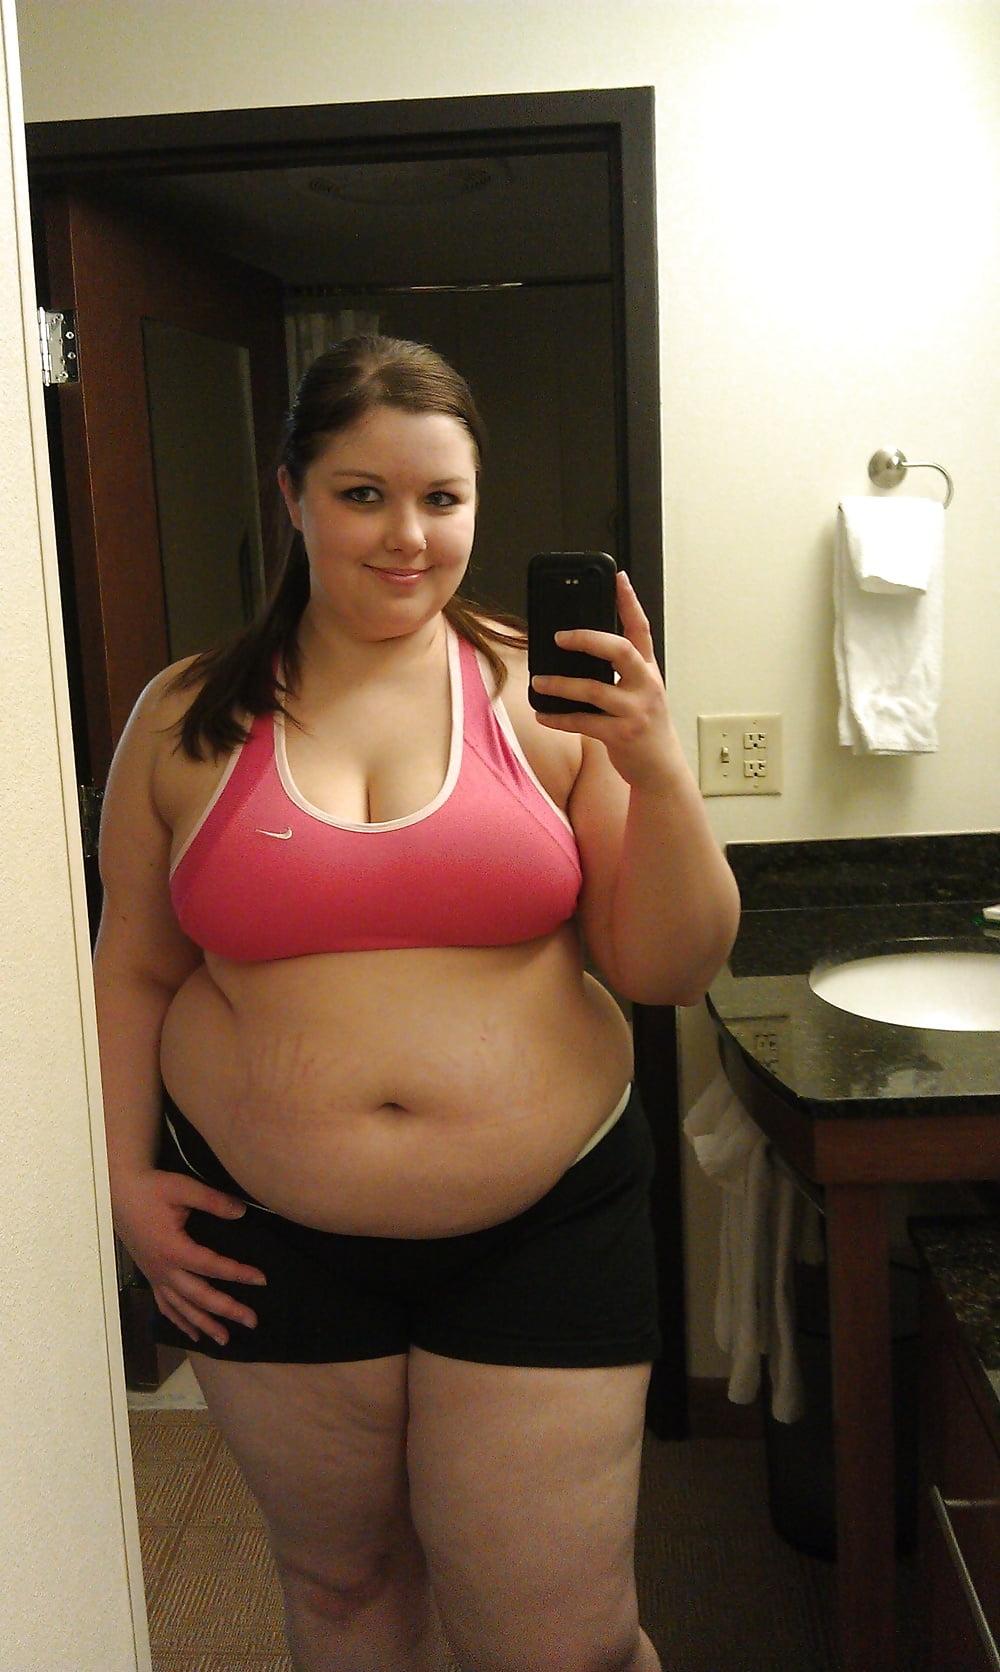 Homemade chubby girl strip